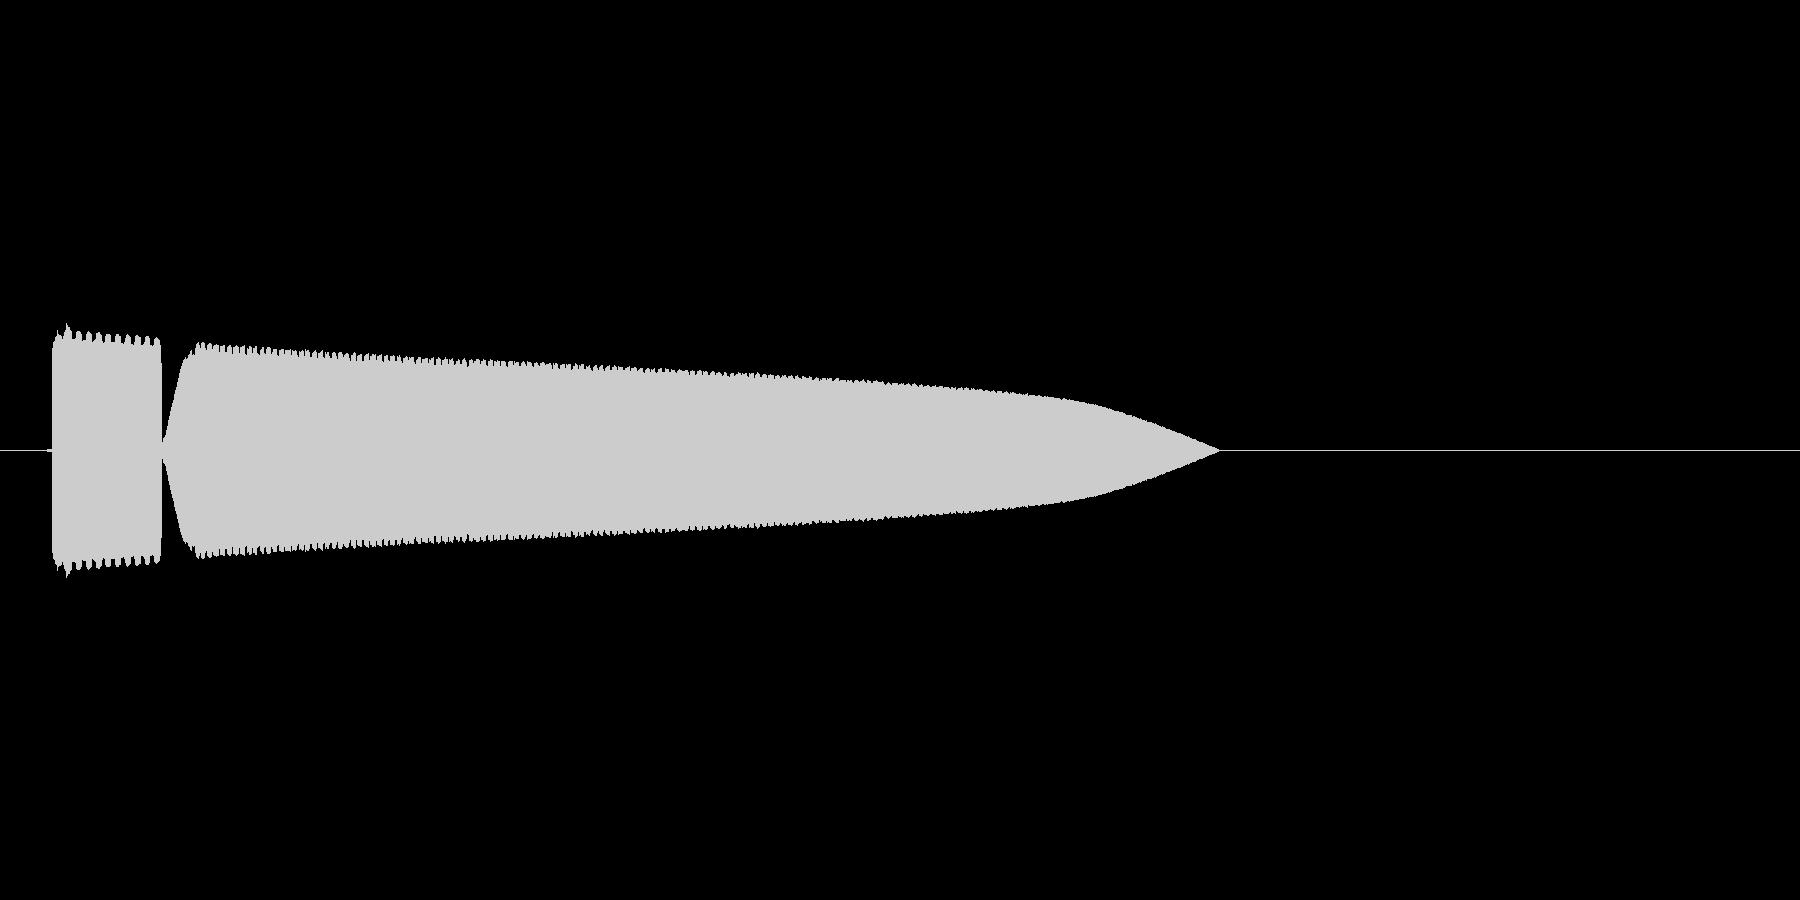 8bitの氷魔法 ピキーンの未再生の波形